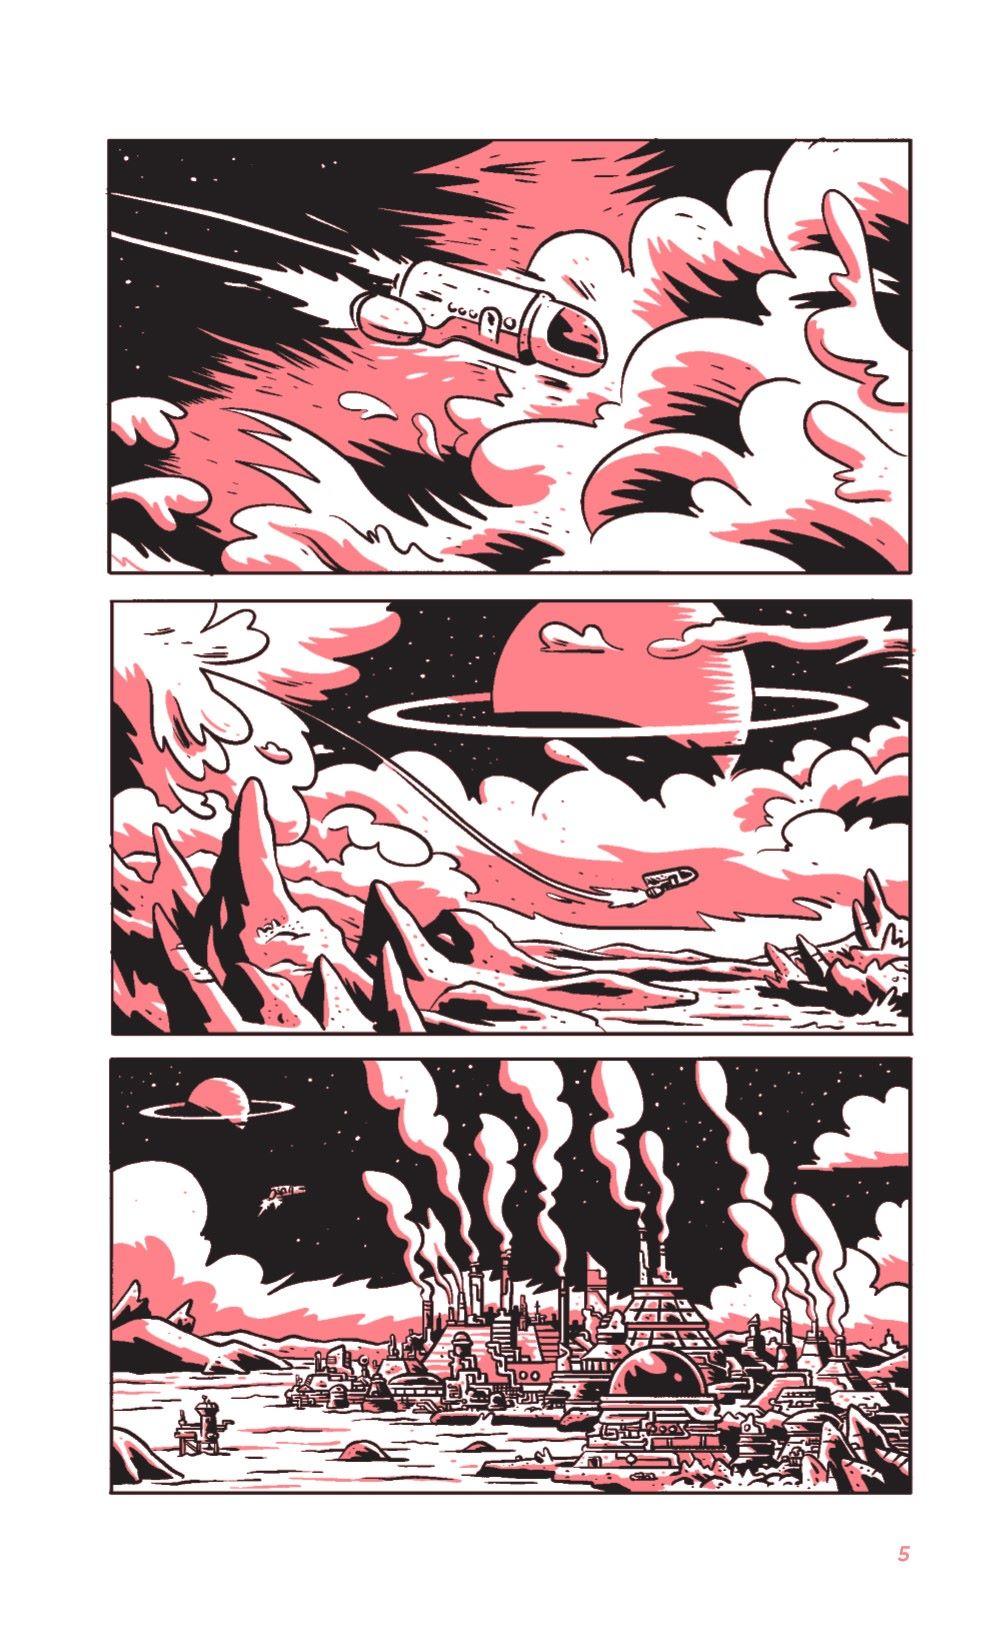 TITAN-REFERENCE-012 ComicList Previews: TITAN GN